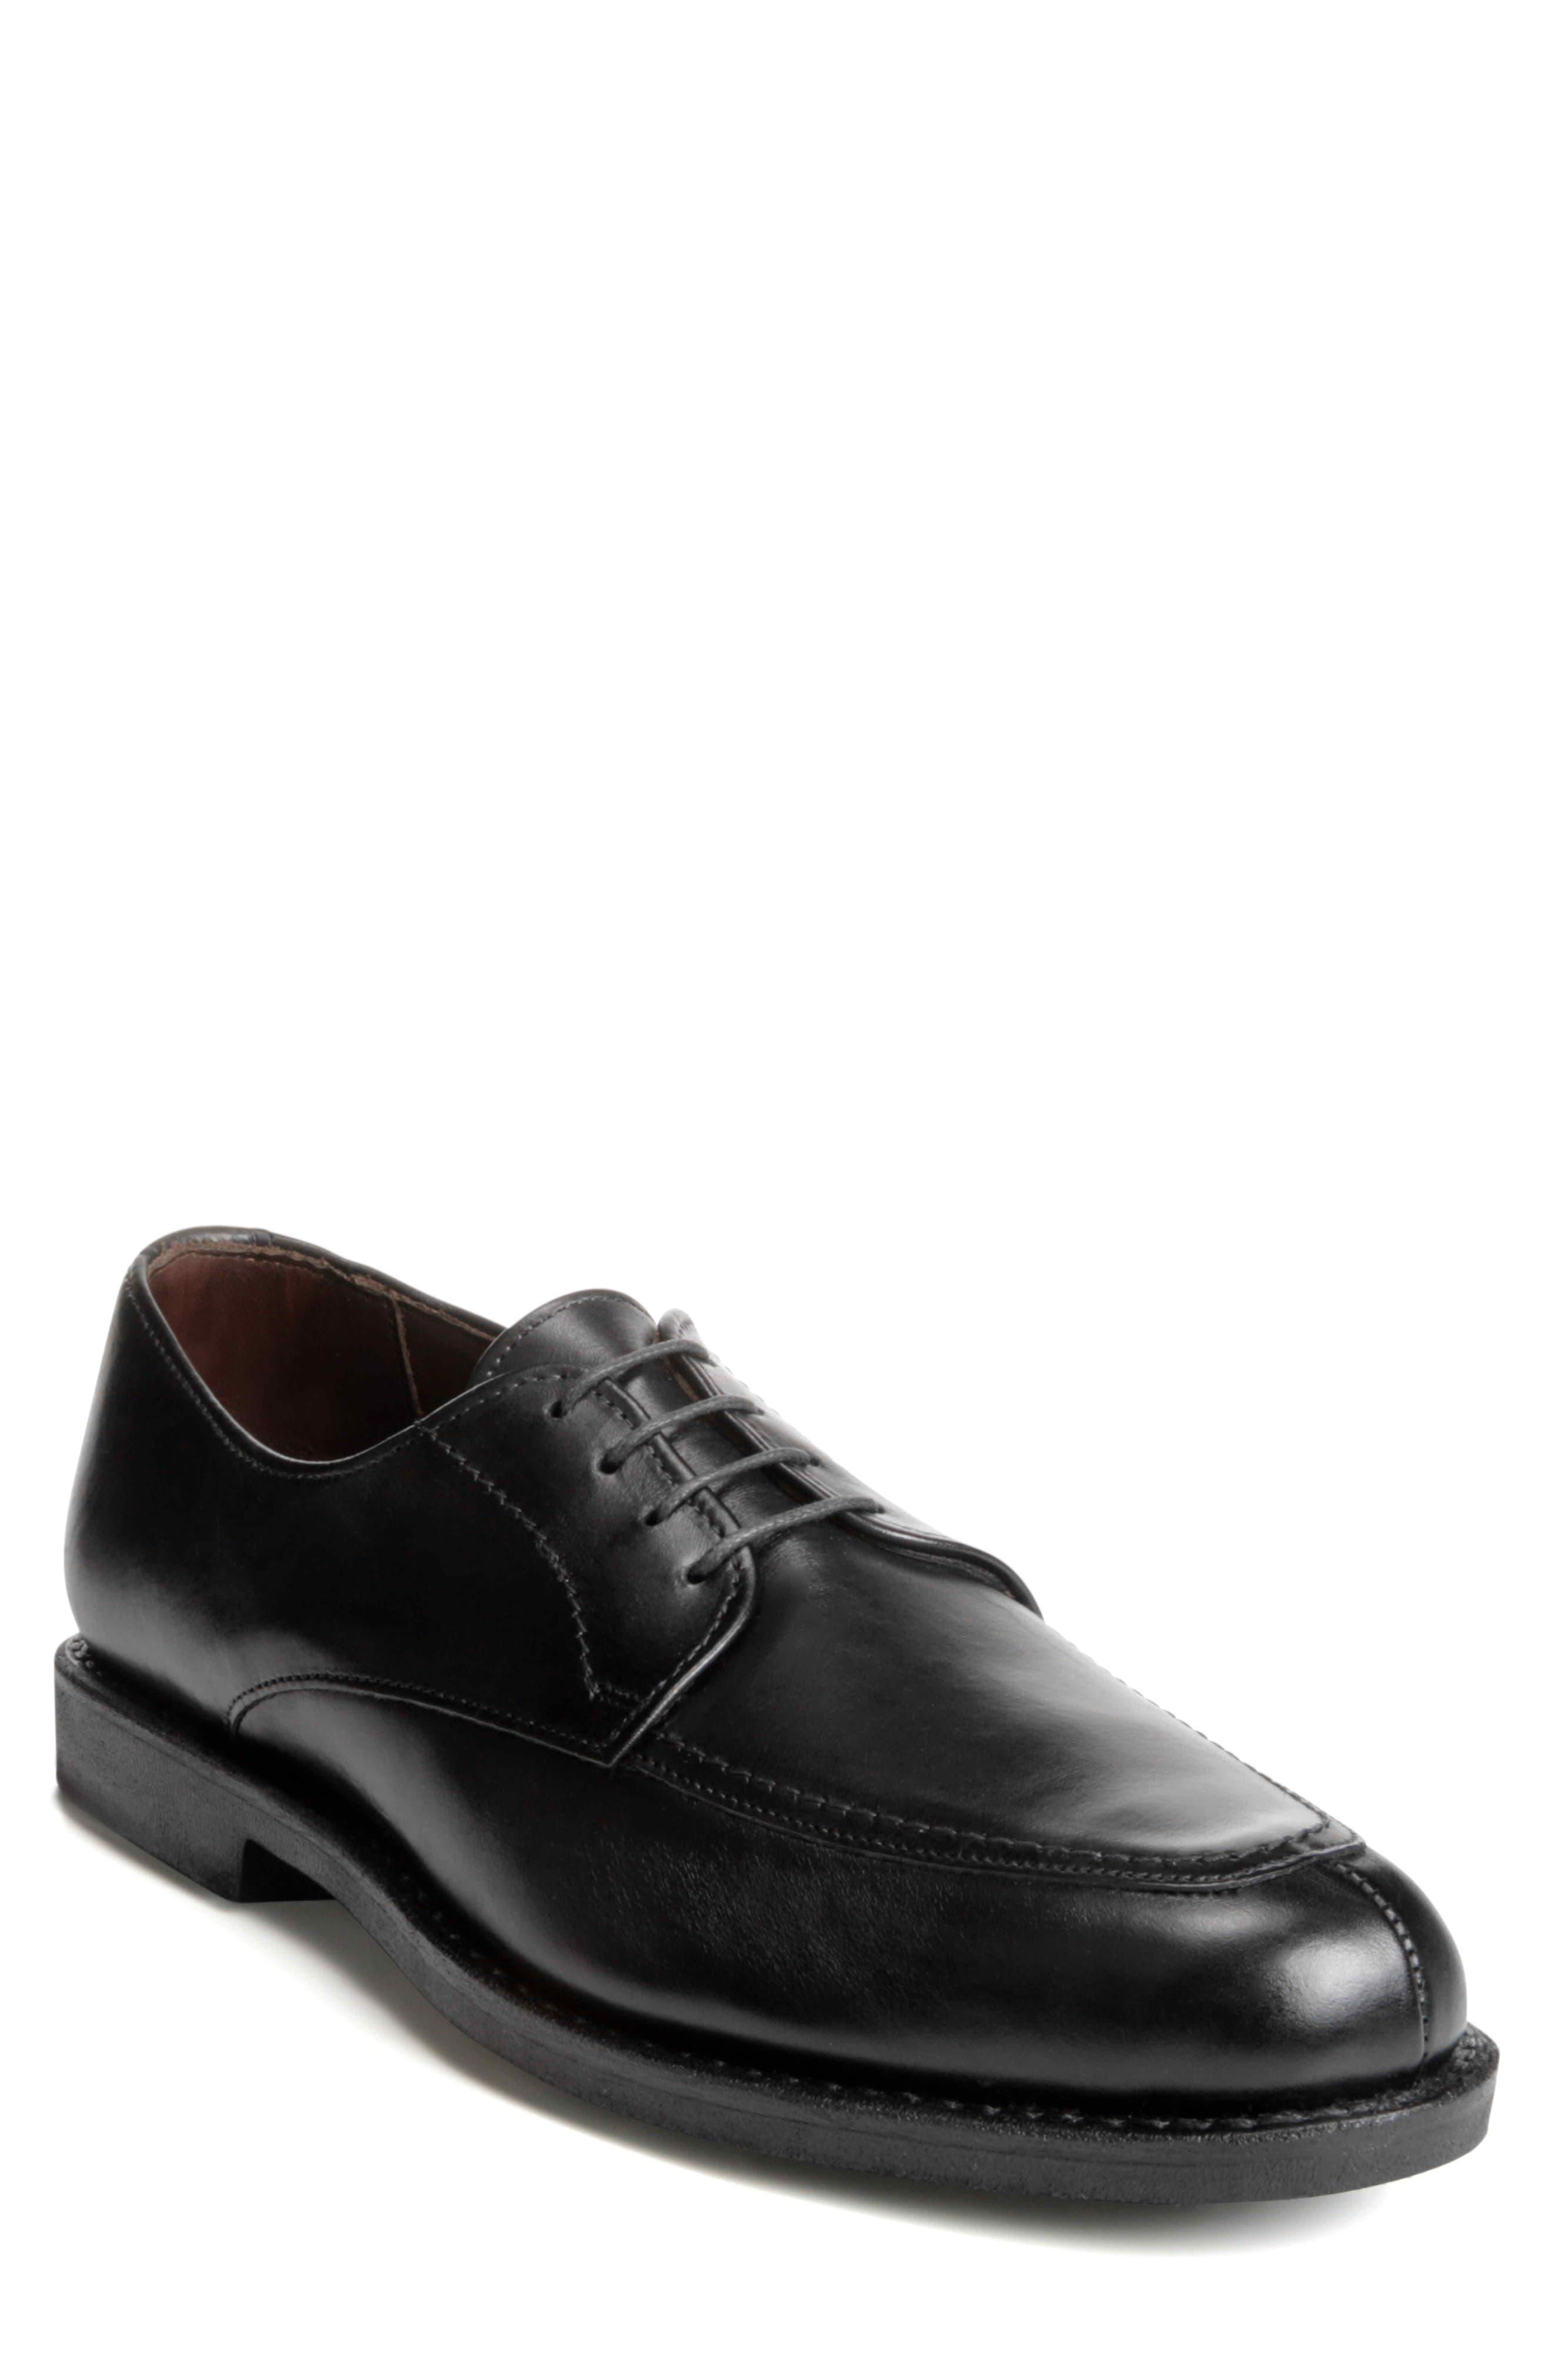 ALLEN EDMONDS MSP Split Toe Derby, Main, color, BLACK LEATHER